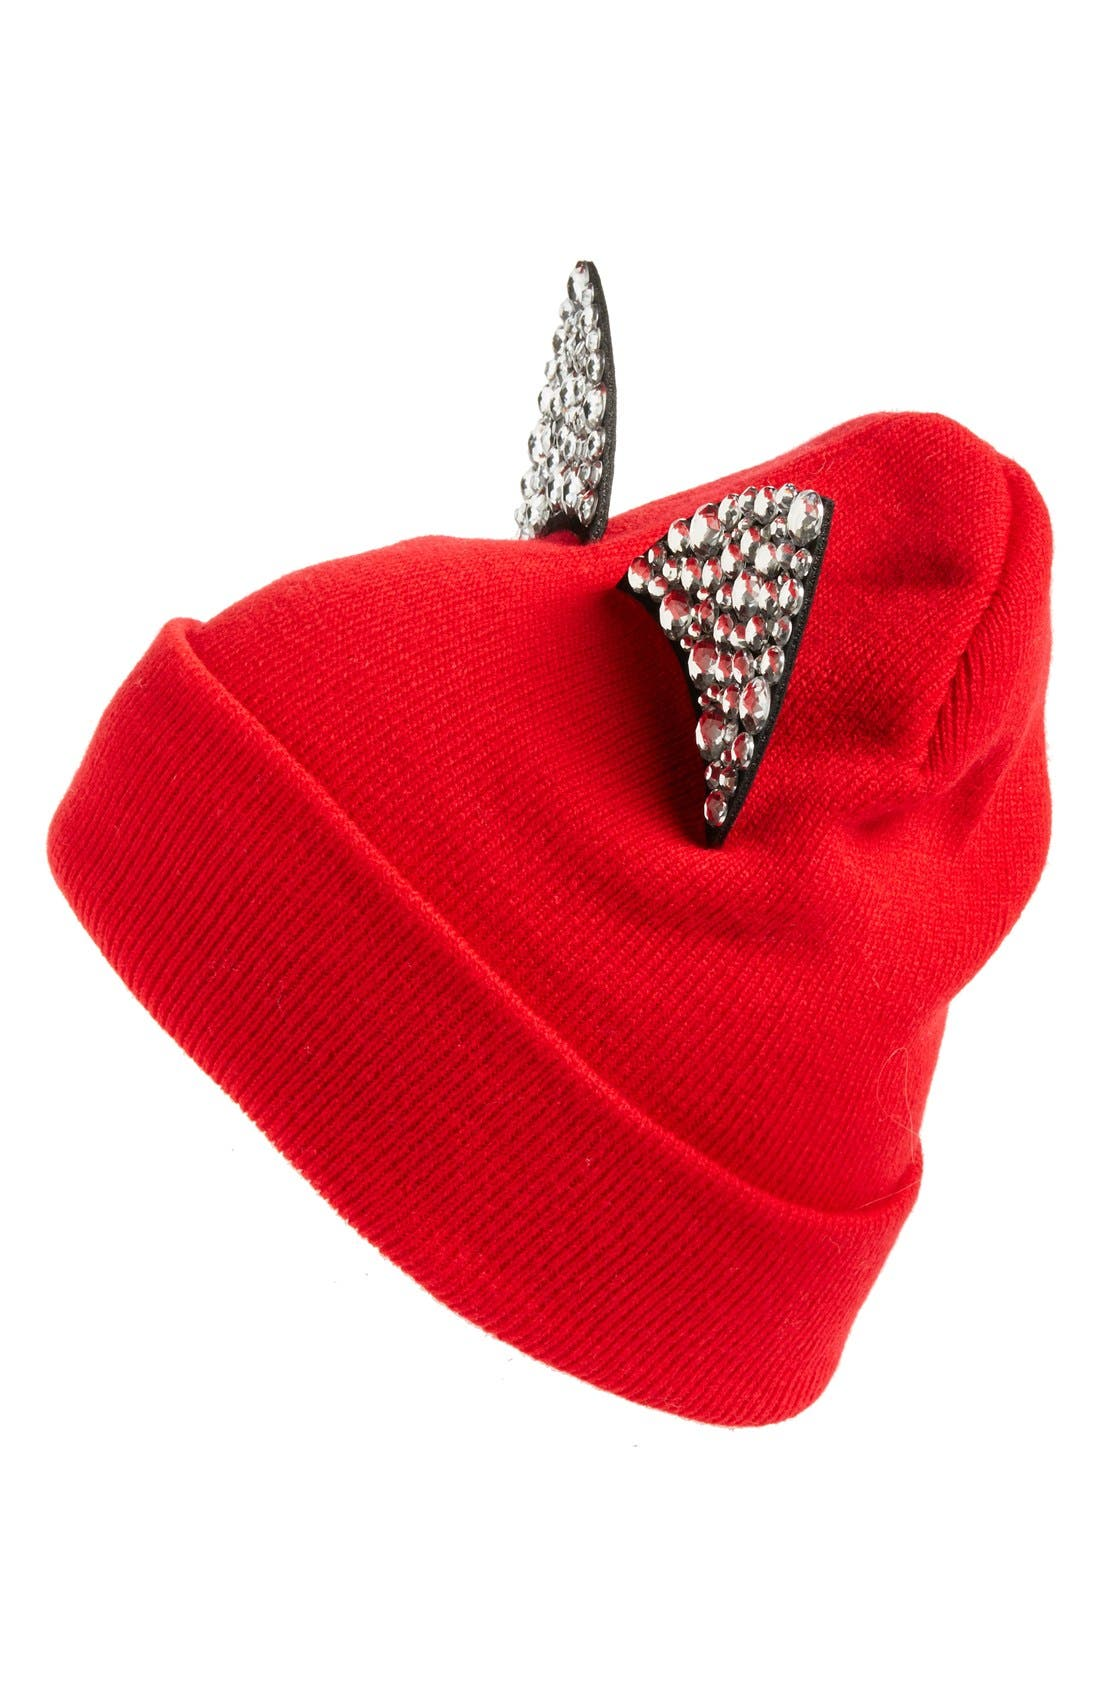 Alternate Image 1 Selected - Tasha Jeweled Cat Ear Beanie